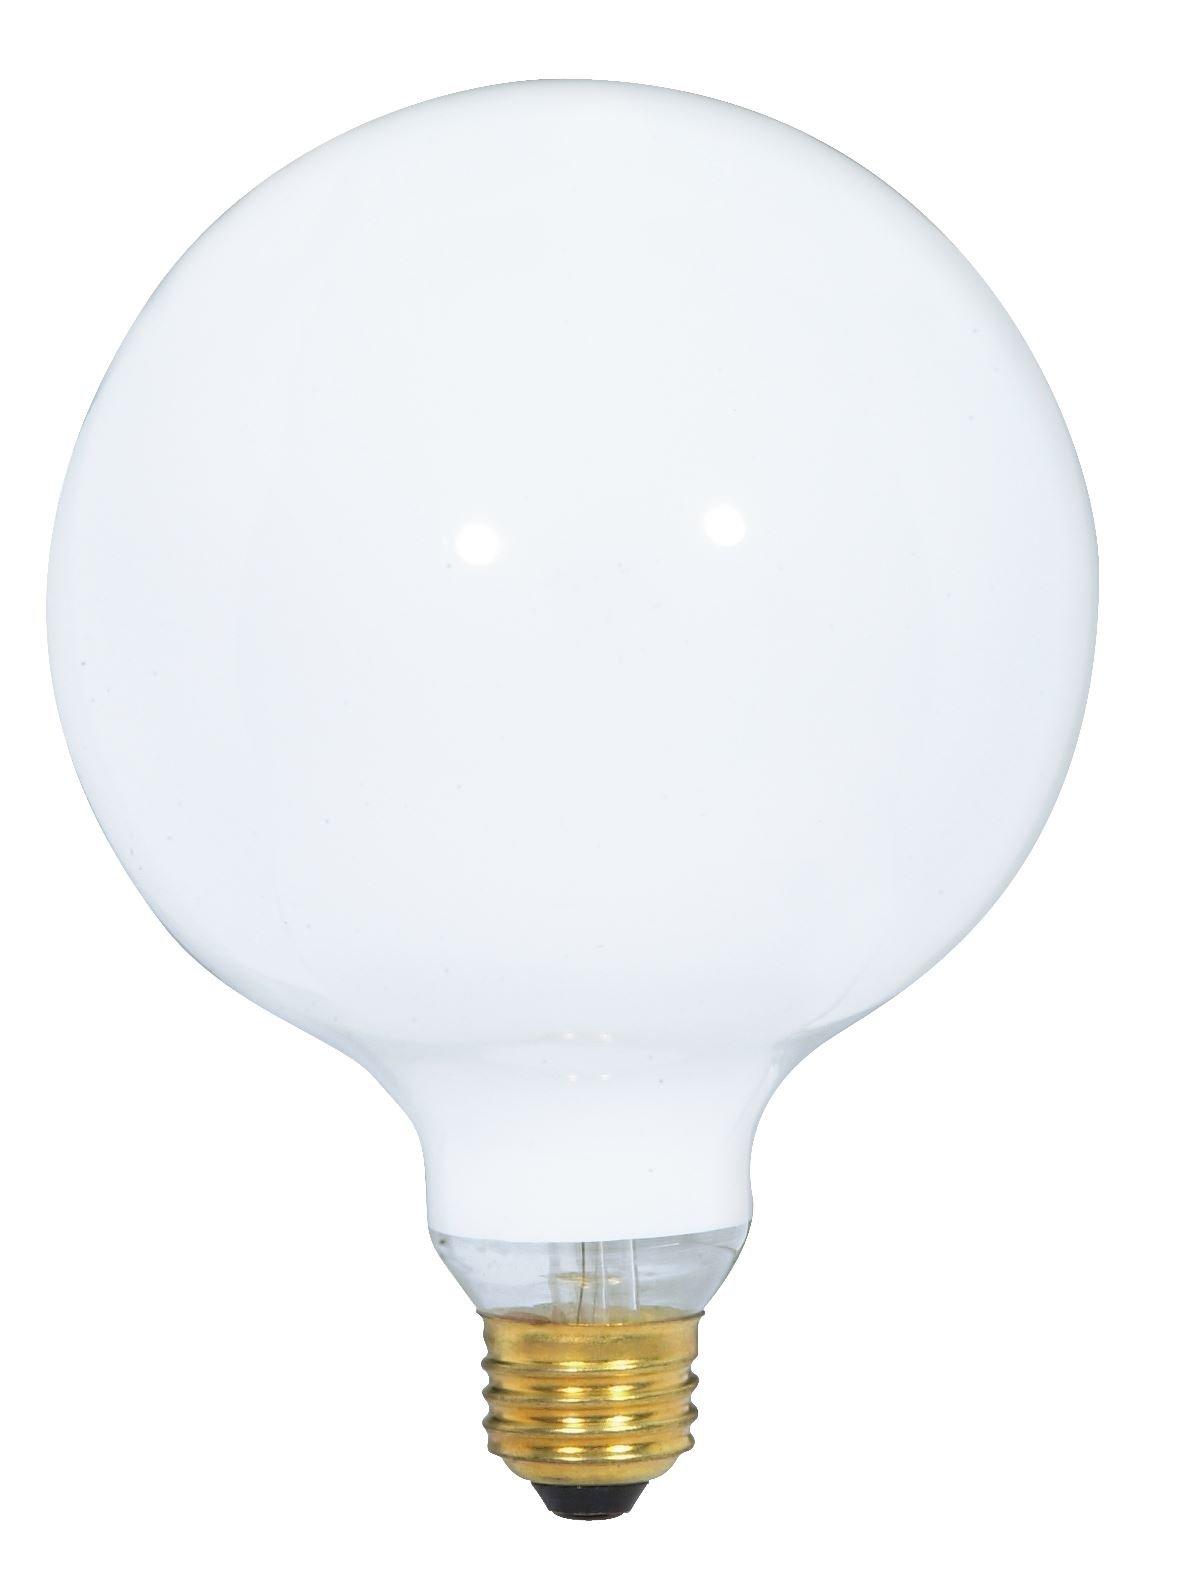 Satco 150G40/W Incandescent Globe Light, 150W E26 G40, Gloss White Bulb [Pack of 12]